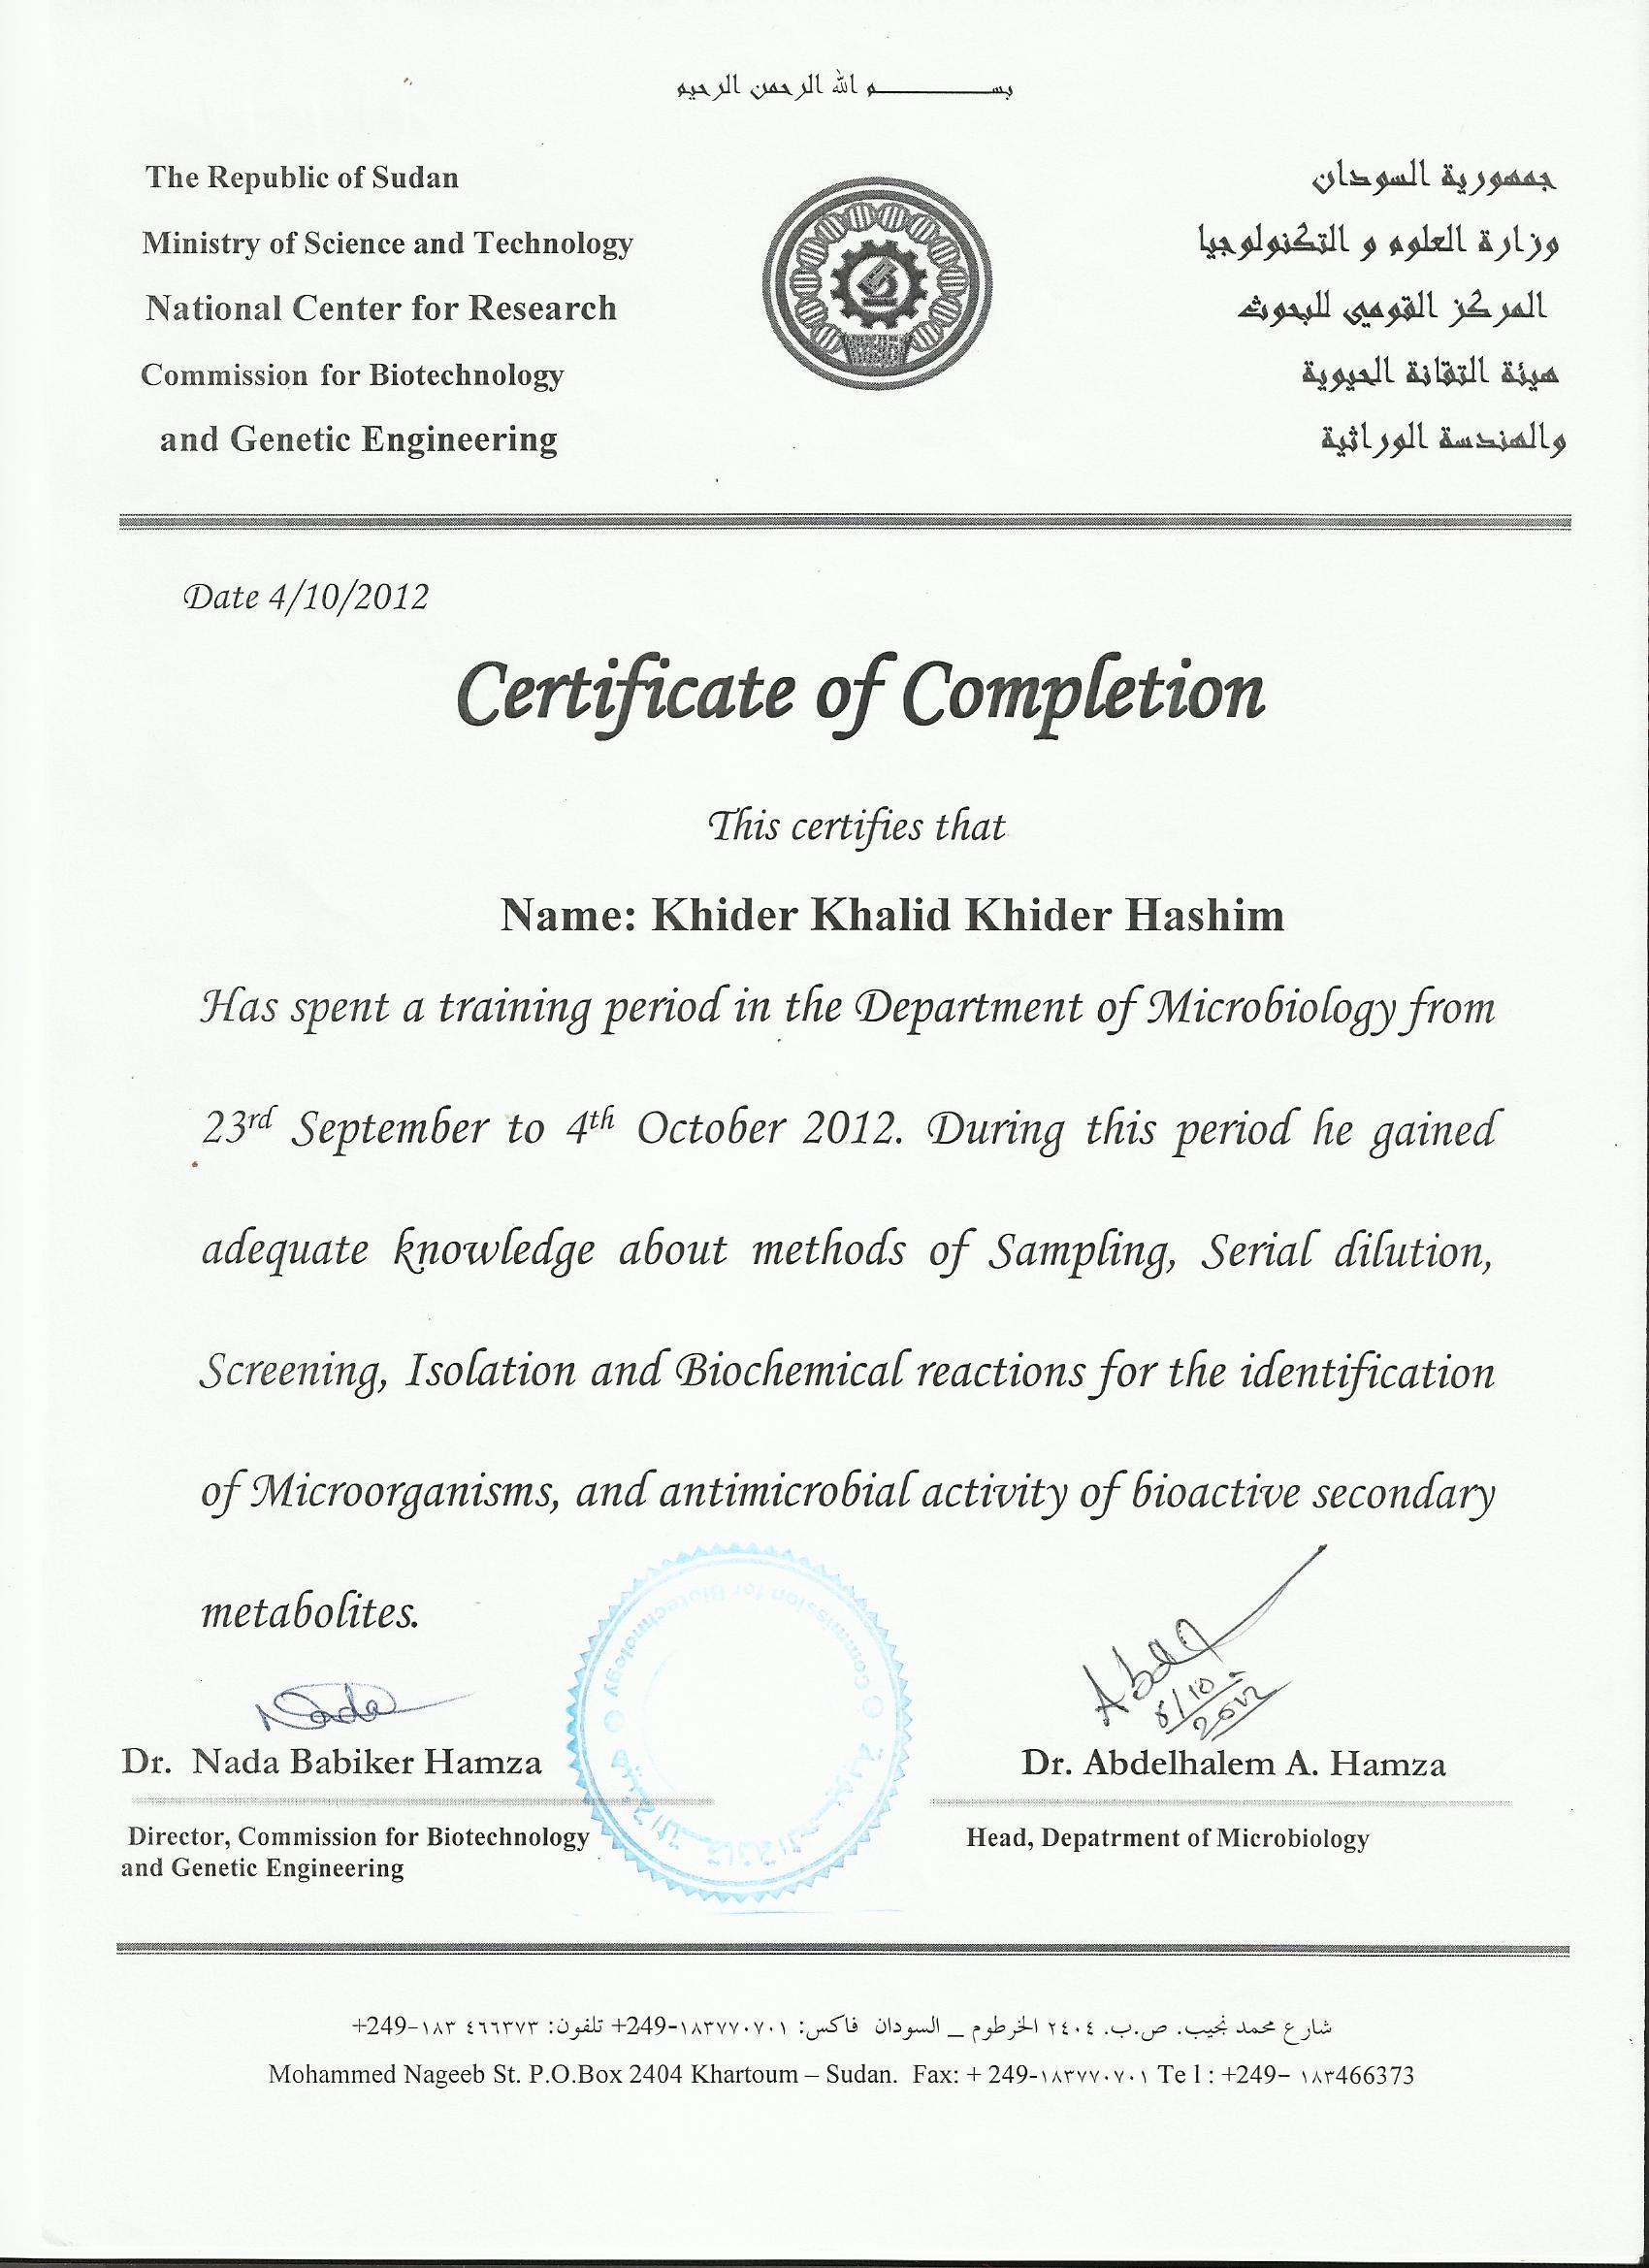 Khider Khalid Khider Hashim Bayt